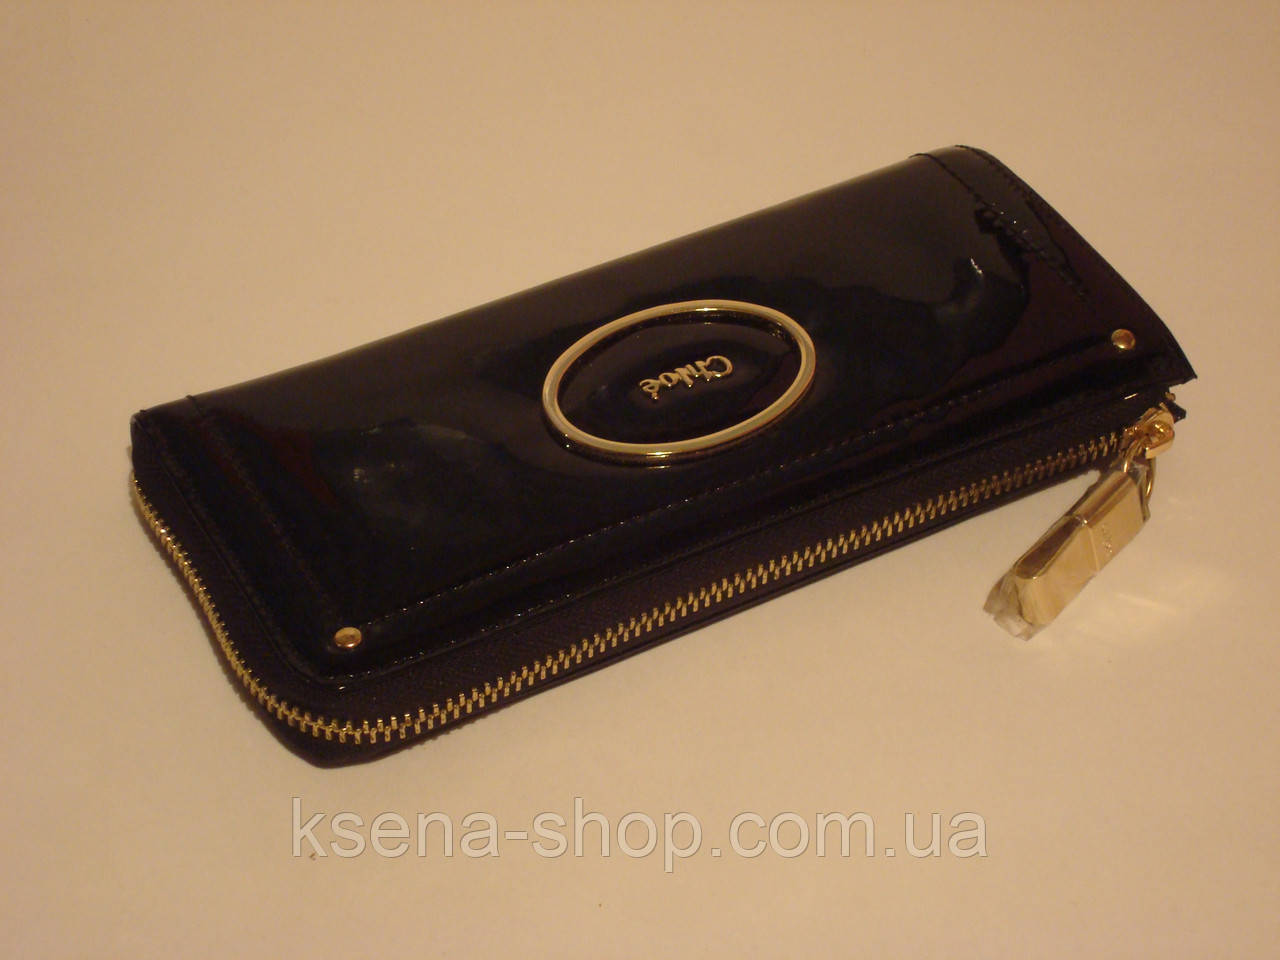 a601c5970a8c Женский кошелек Chloe-2, цена 420 грн., купить в Одессе — Prom.ua  (ID#82453564)